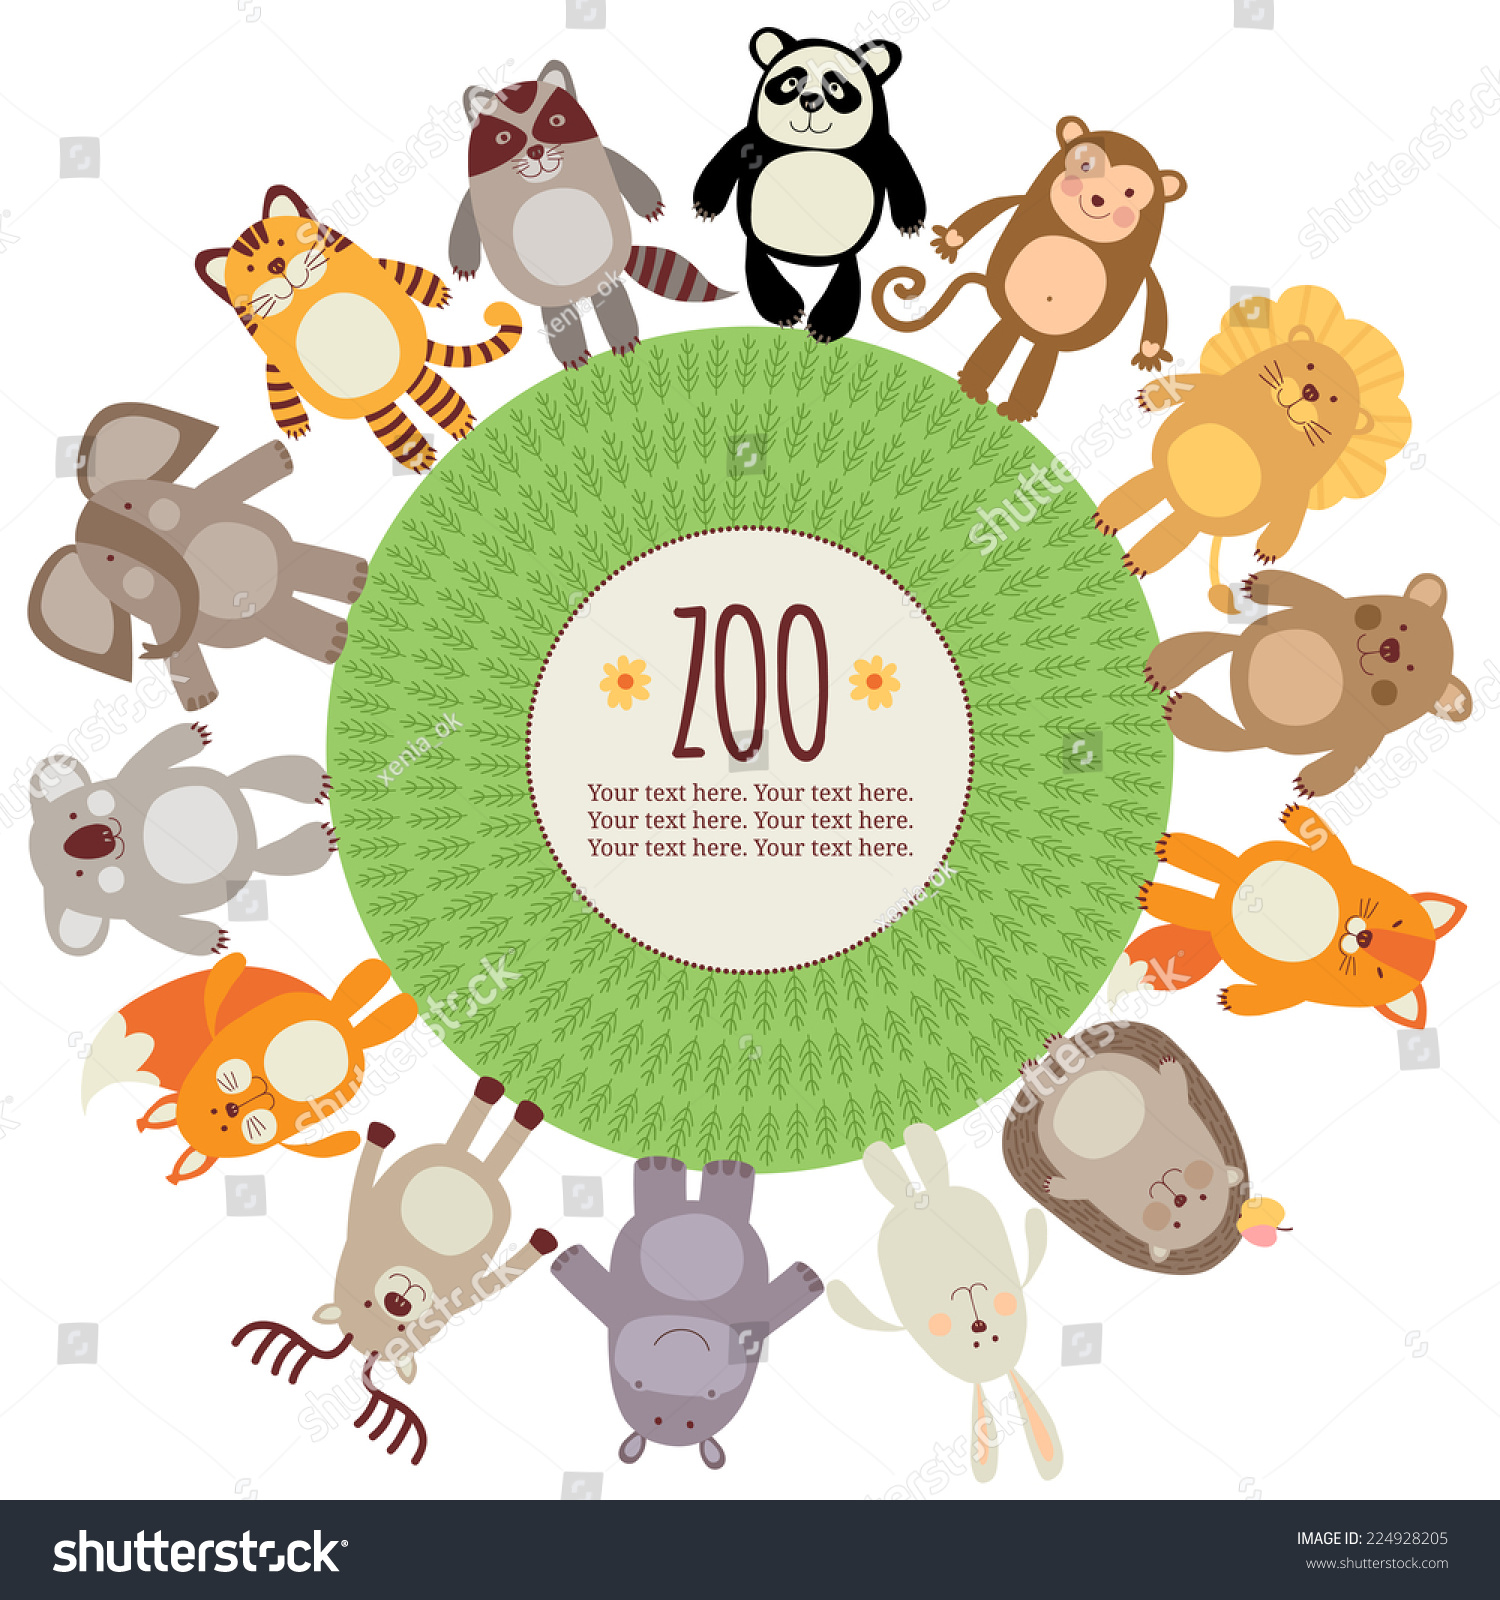 template card banner wild animals zoo stock vector 224928205